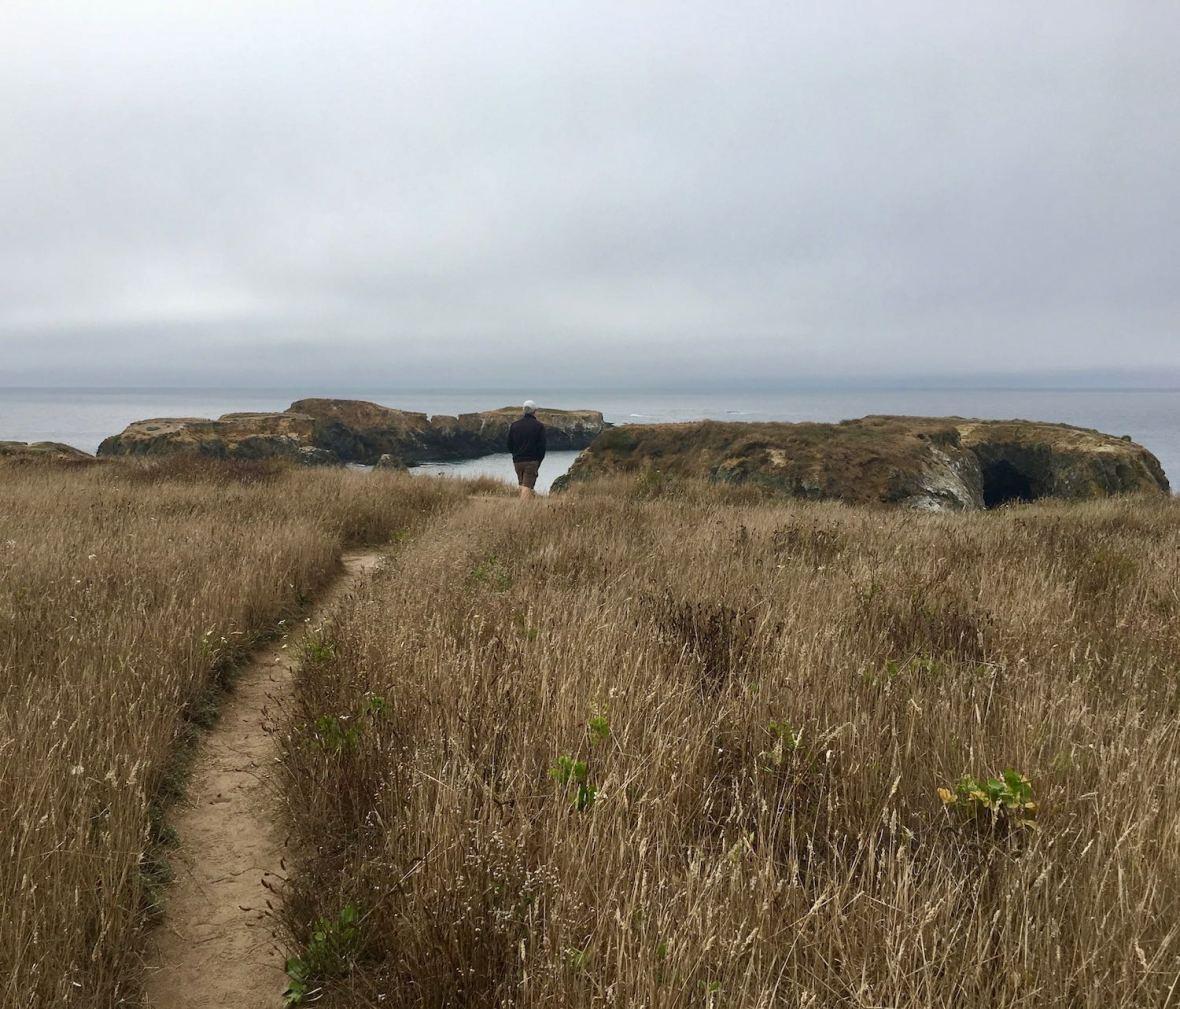 Mendocino Headlands State Park on California's Pacific Coast Highway 1